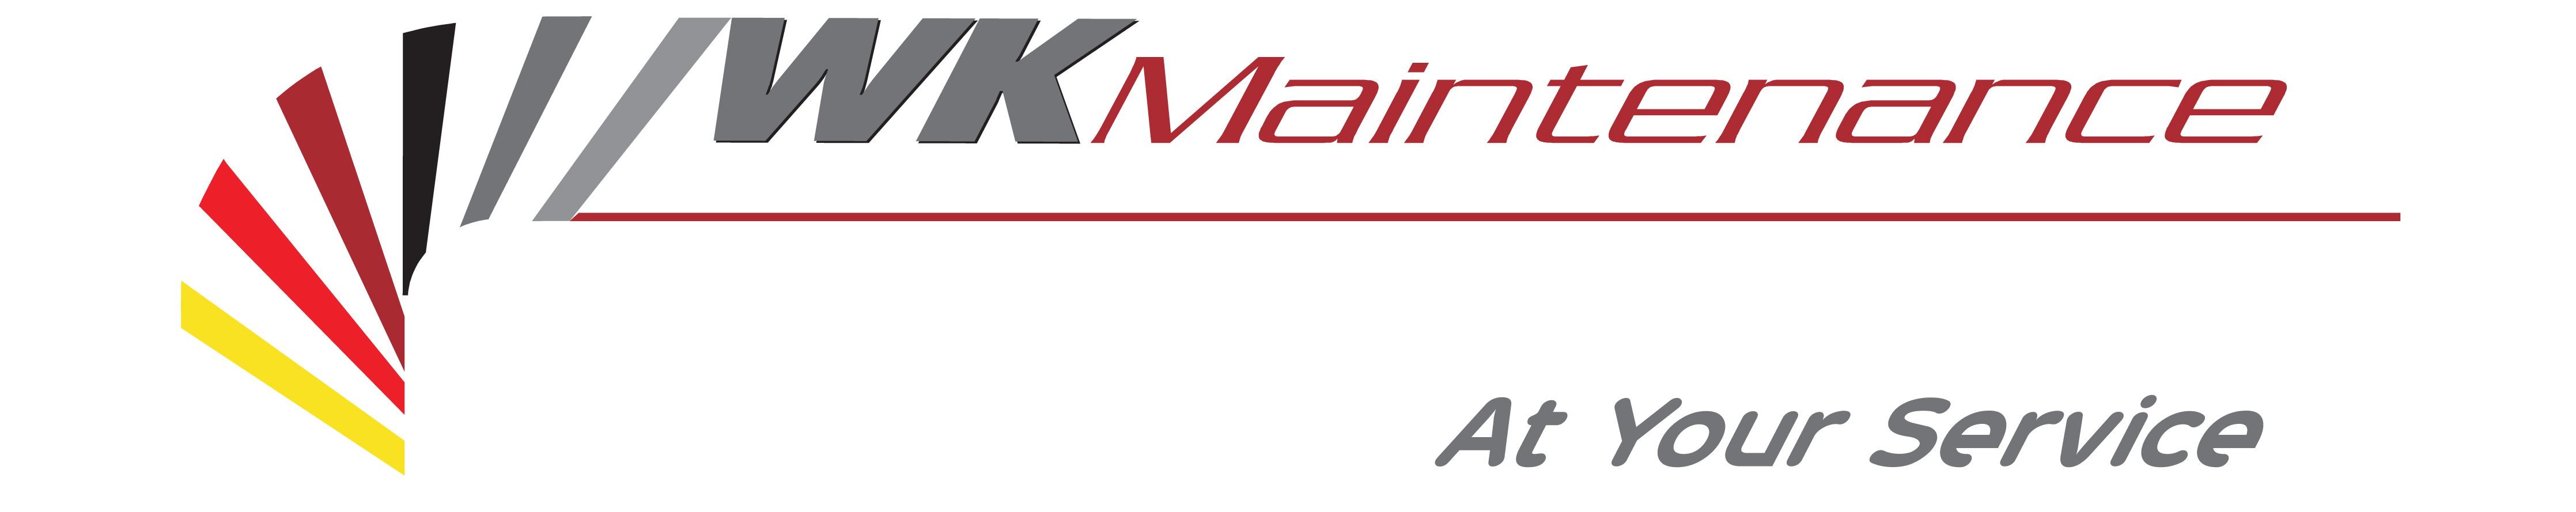 WK Maintenance Services Logo